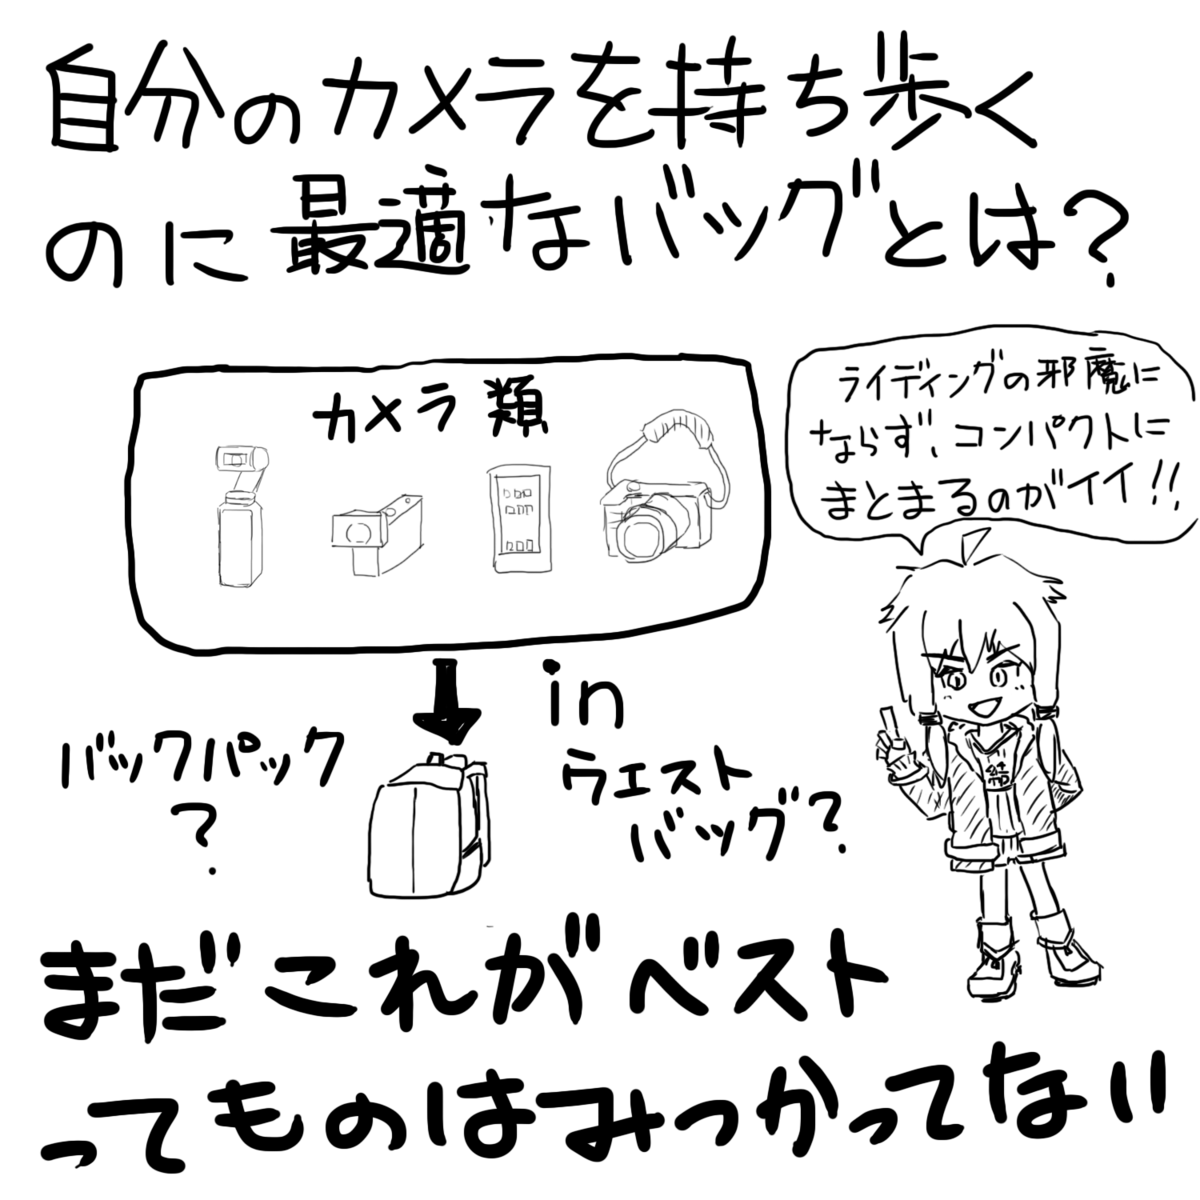 f:id:zomuzomu:20200618120919p:plain